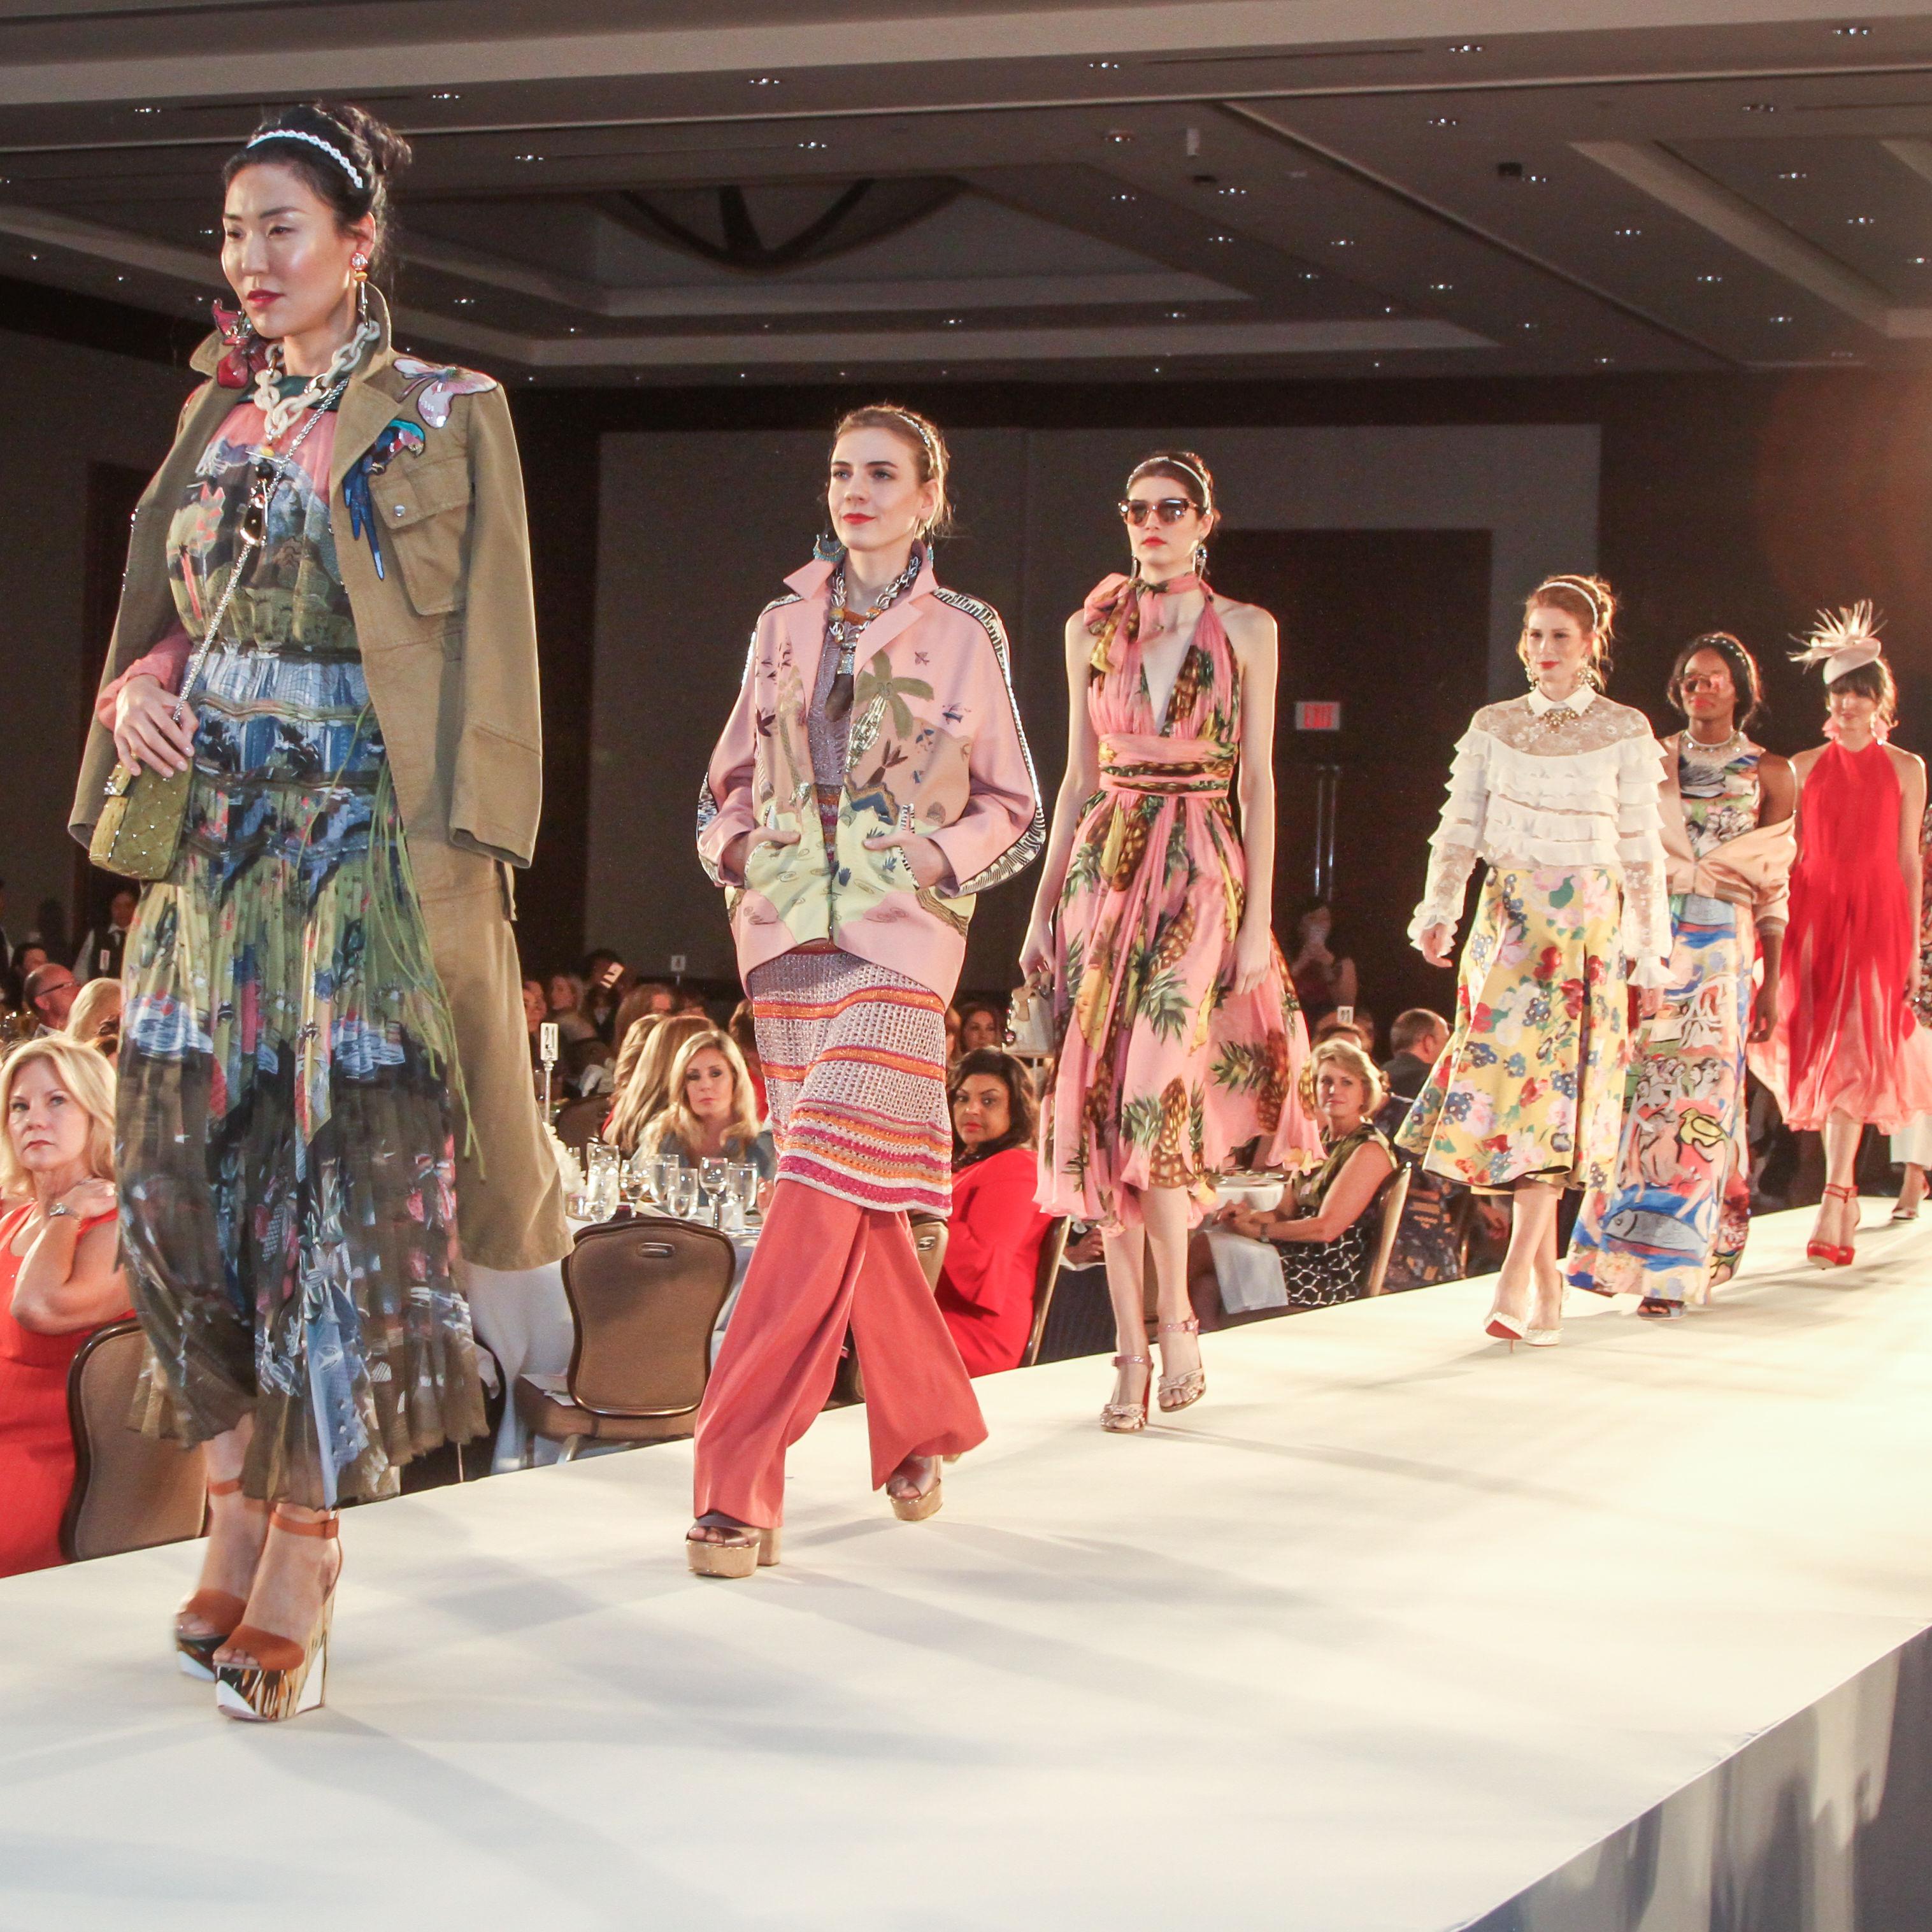 Models in neiman marcus fashions cxergi